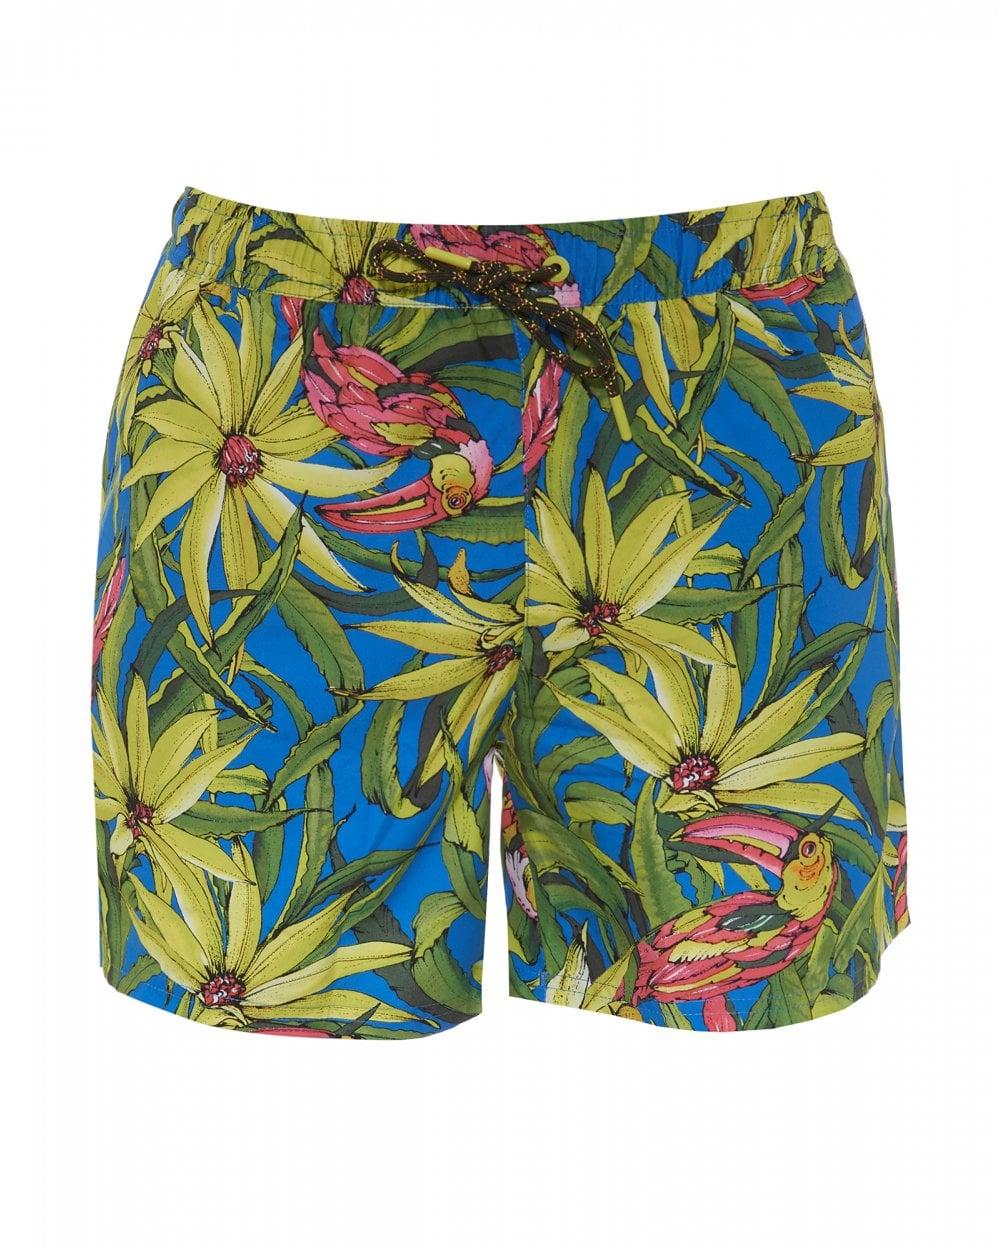 2cb5ccb081 BOSS Mens Threadfin Swimming Shorts, Floral Print Swimming Trunks